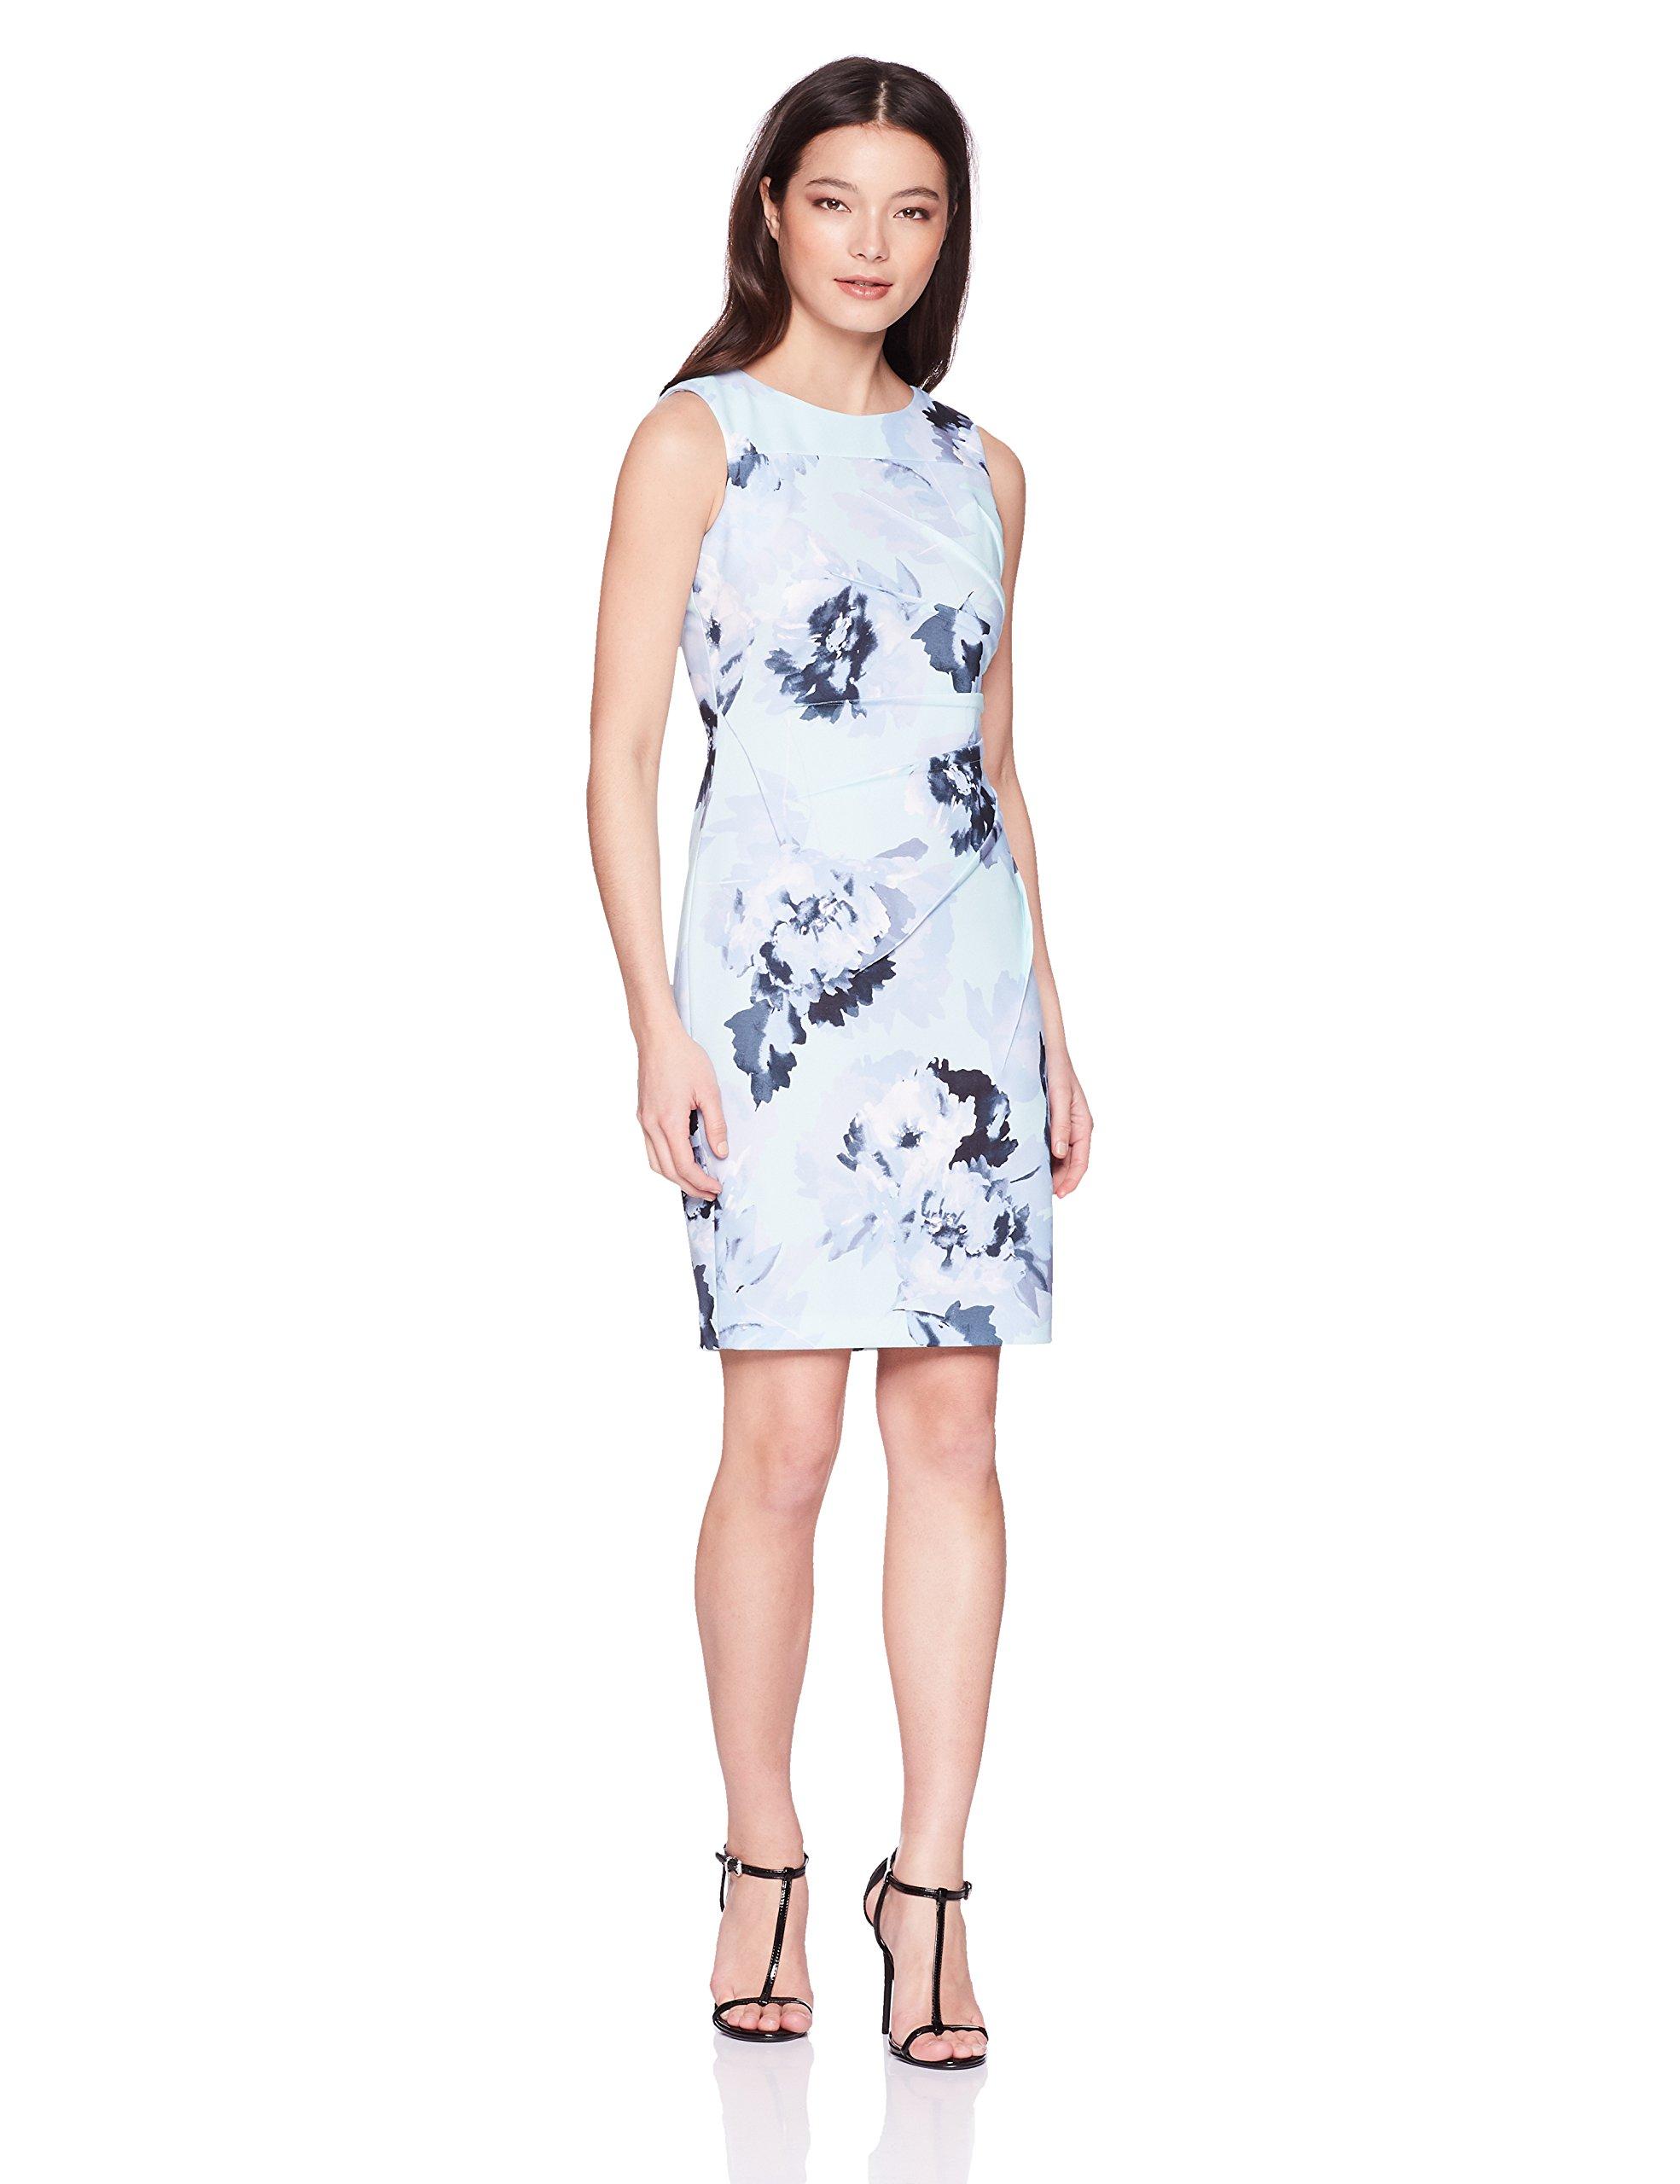 Calvin Klein Women's Petite Sleeveless Starburst Sheath Dress, Serene Multi, 8P